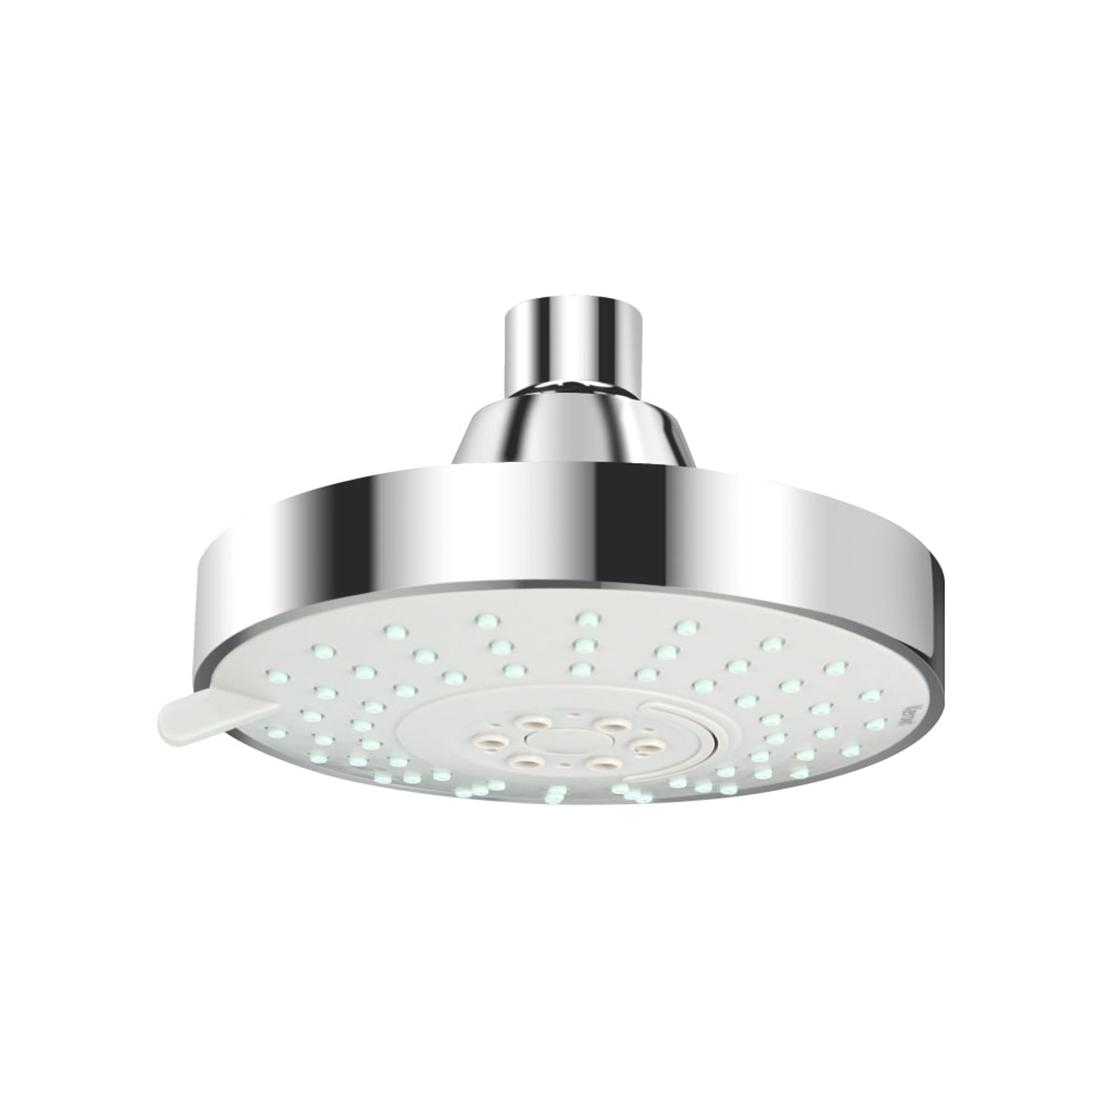 Kerovit KA560003 Three Function Overhead Shower